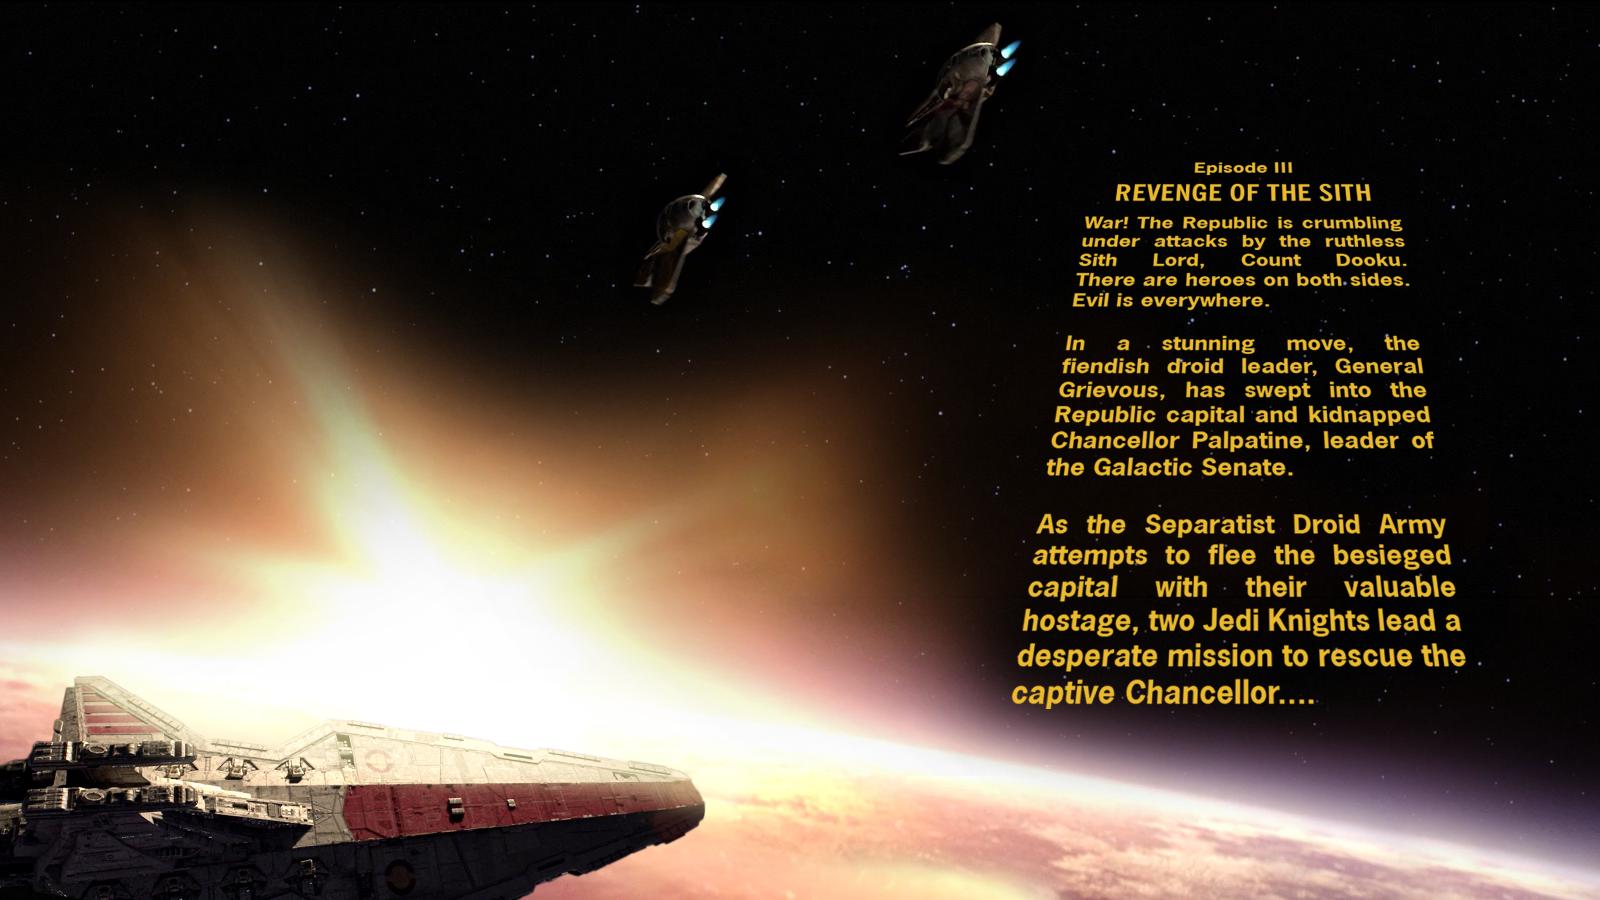 Star Wars Episode Iii Crawl Wallpaper By Spirit Of Adventure On